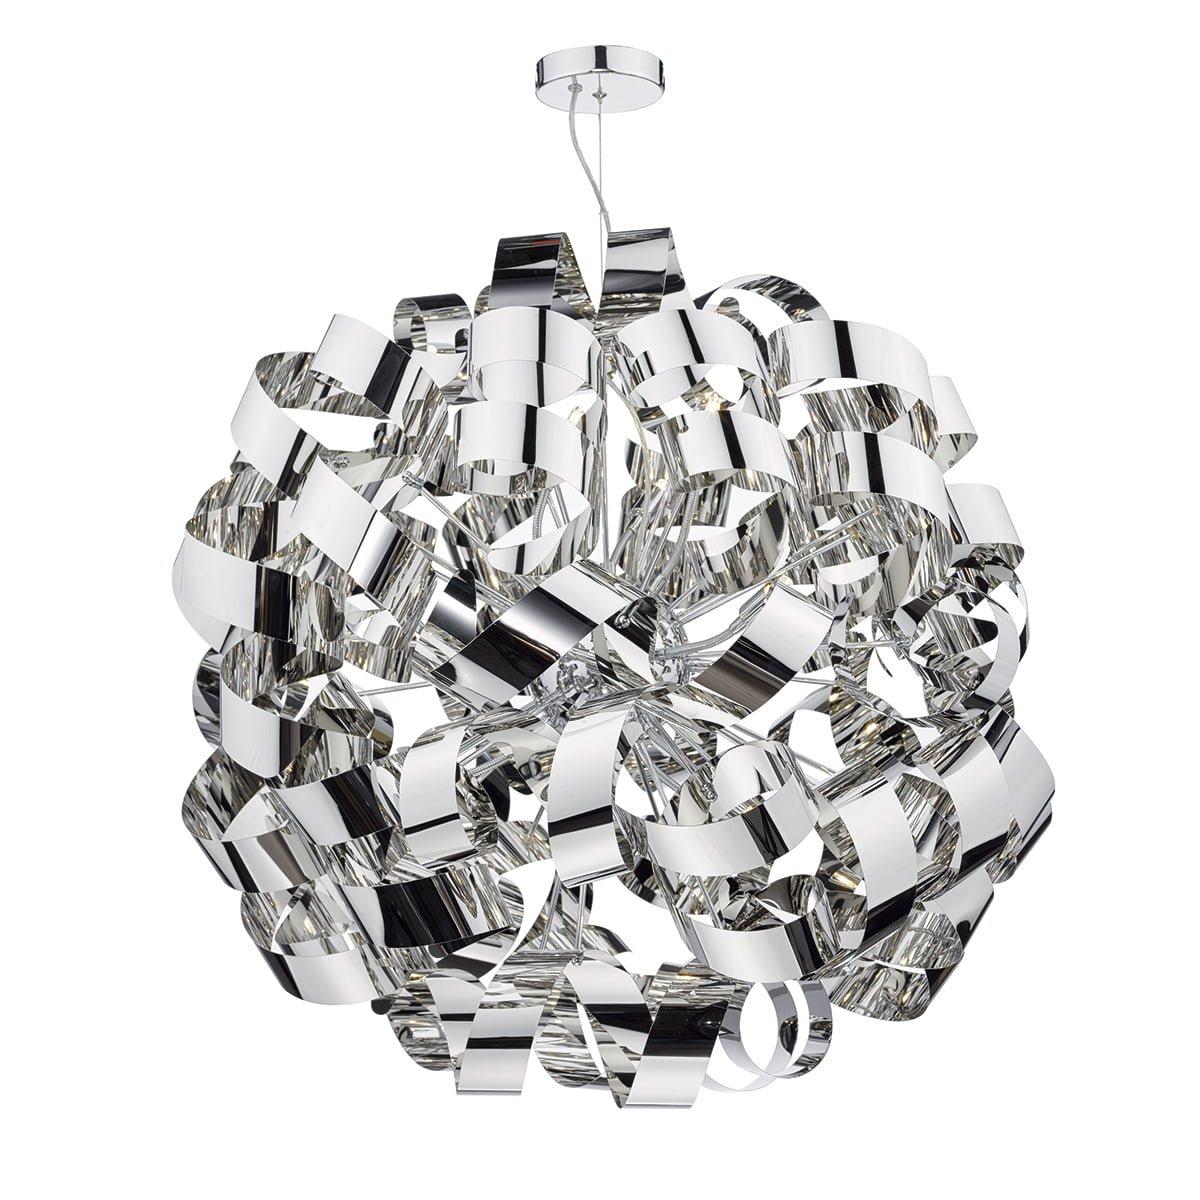 Dar RAW1255 Rawley 12 Light Ball Pendant in Polished Chrome